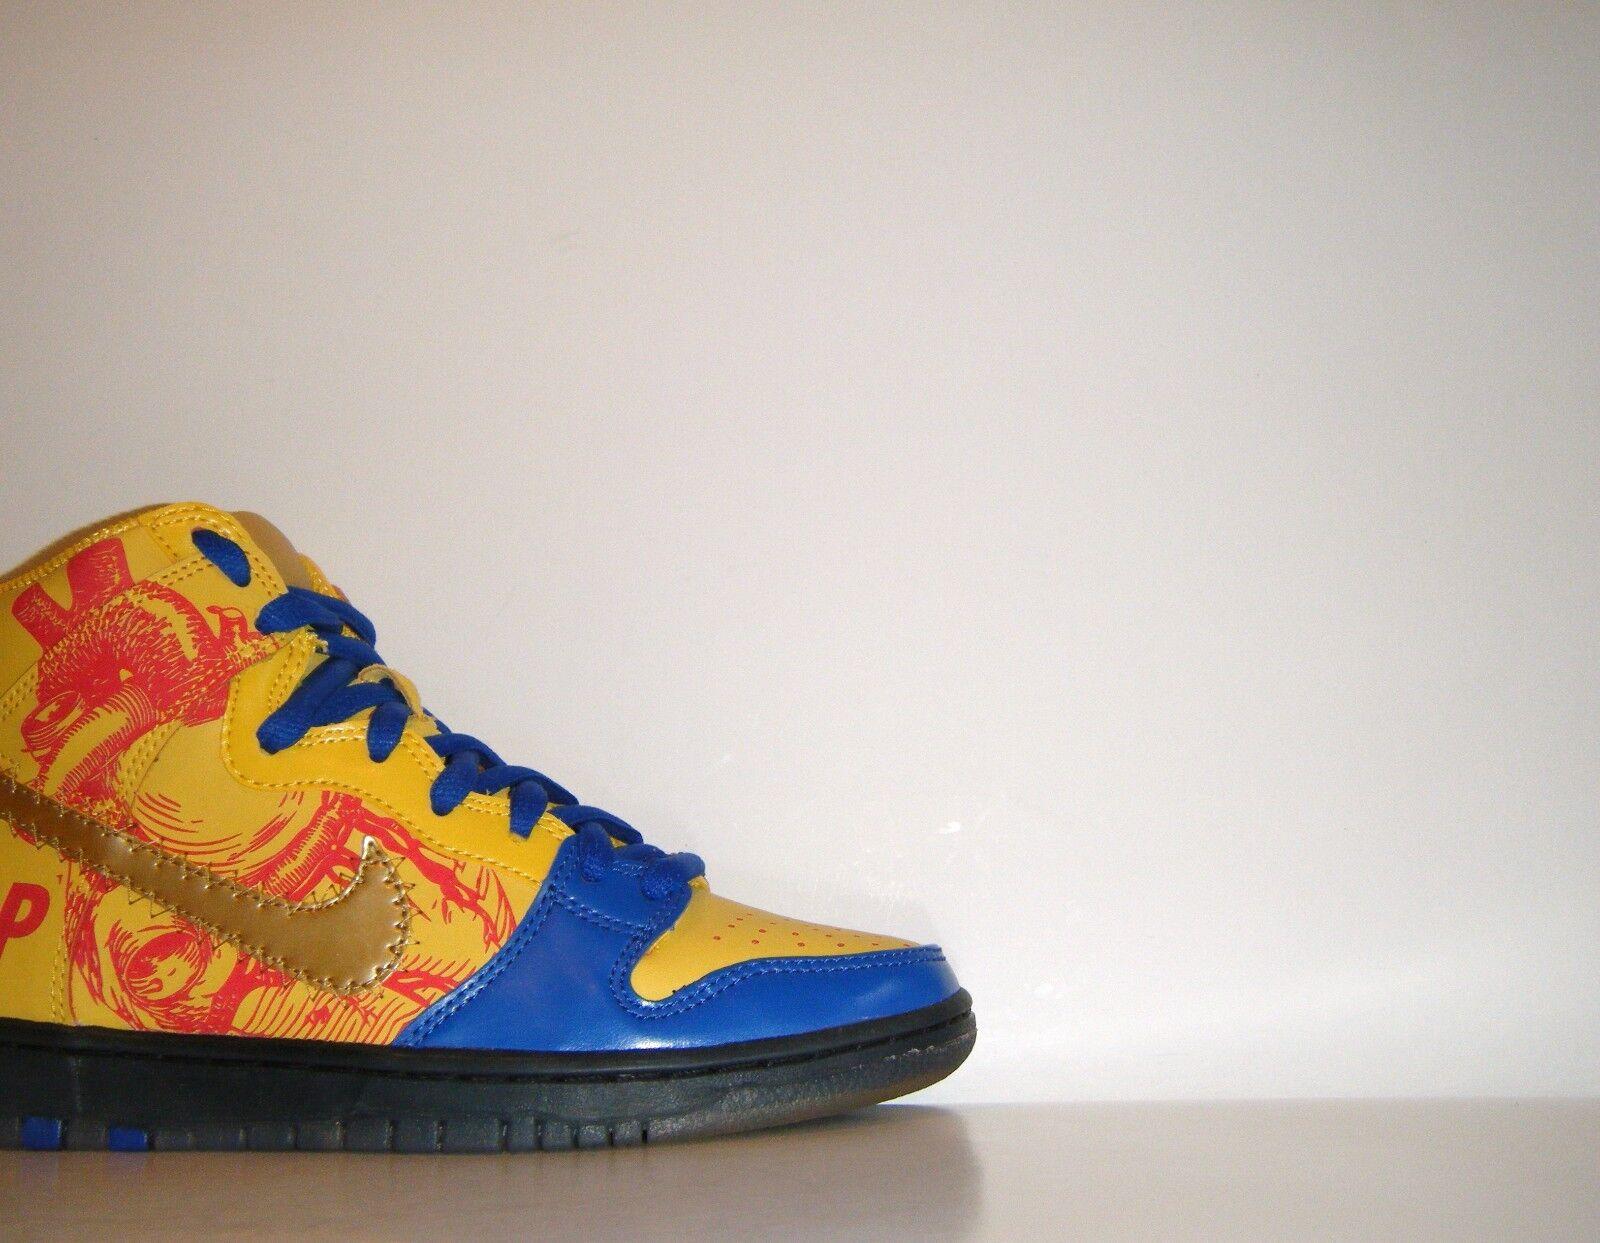 2012 Nike SB Dunk High Pro Premium Premium Pro DB Doernbecher Sz 7 Warriors Heart 579603-740 59e60c